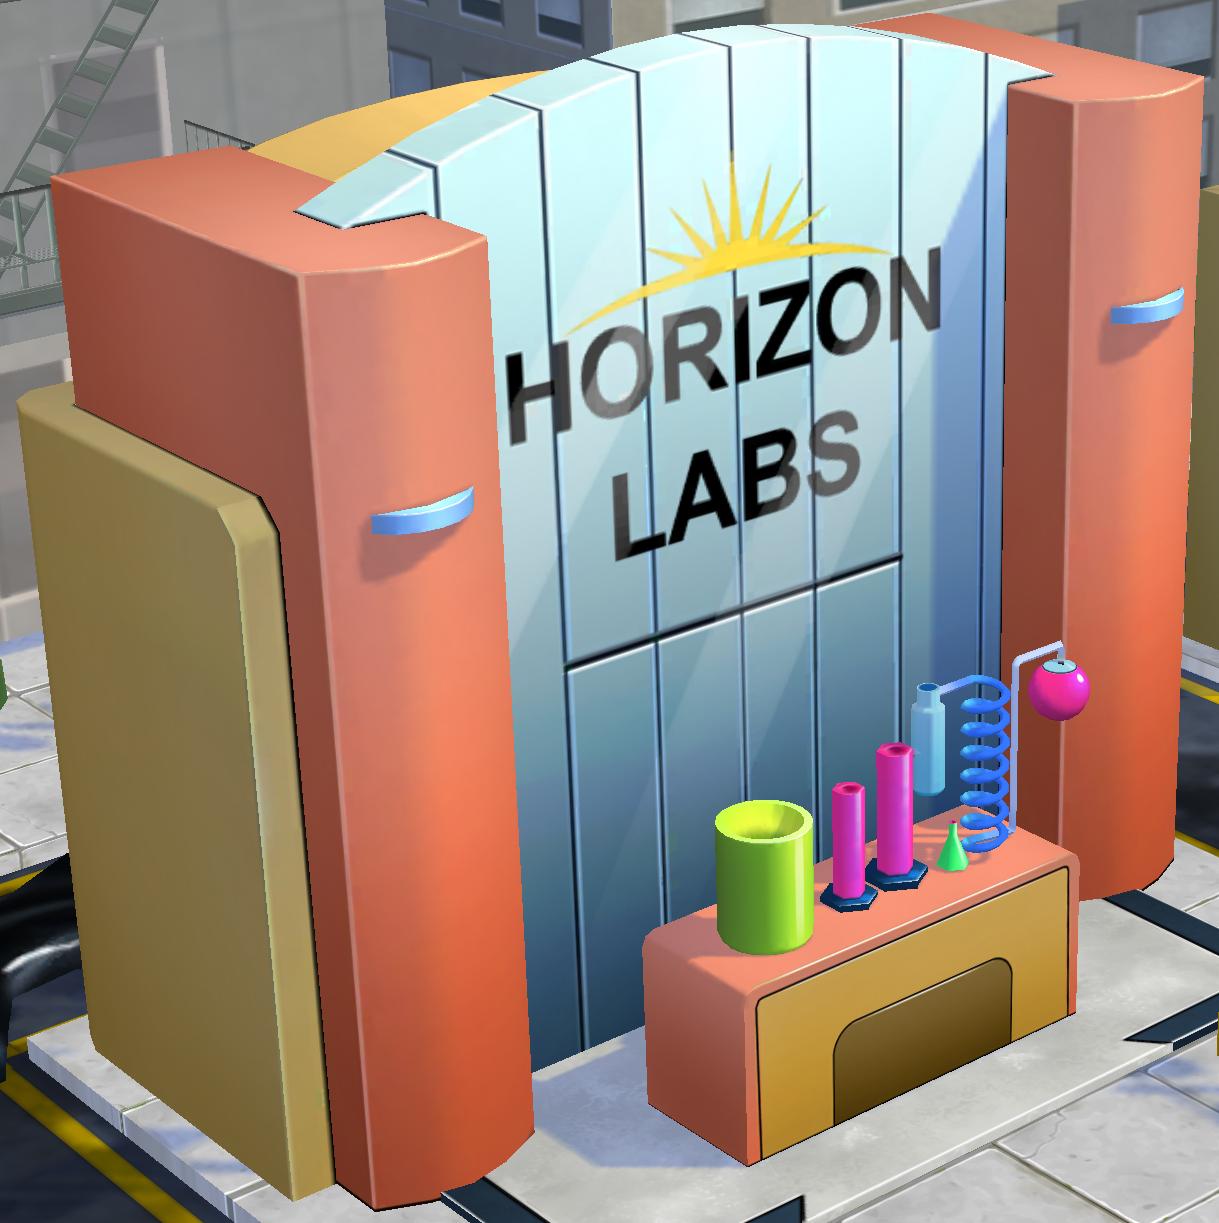 Horizon Labs (Earth-TRN562)